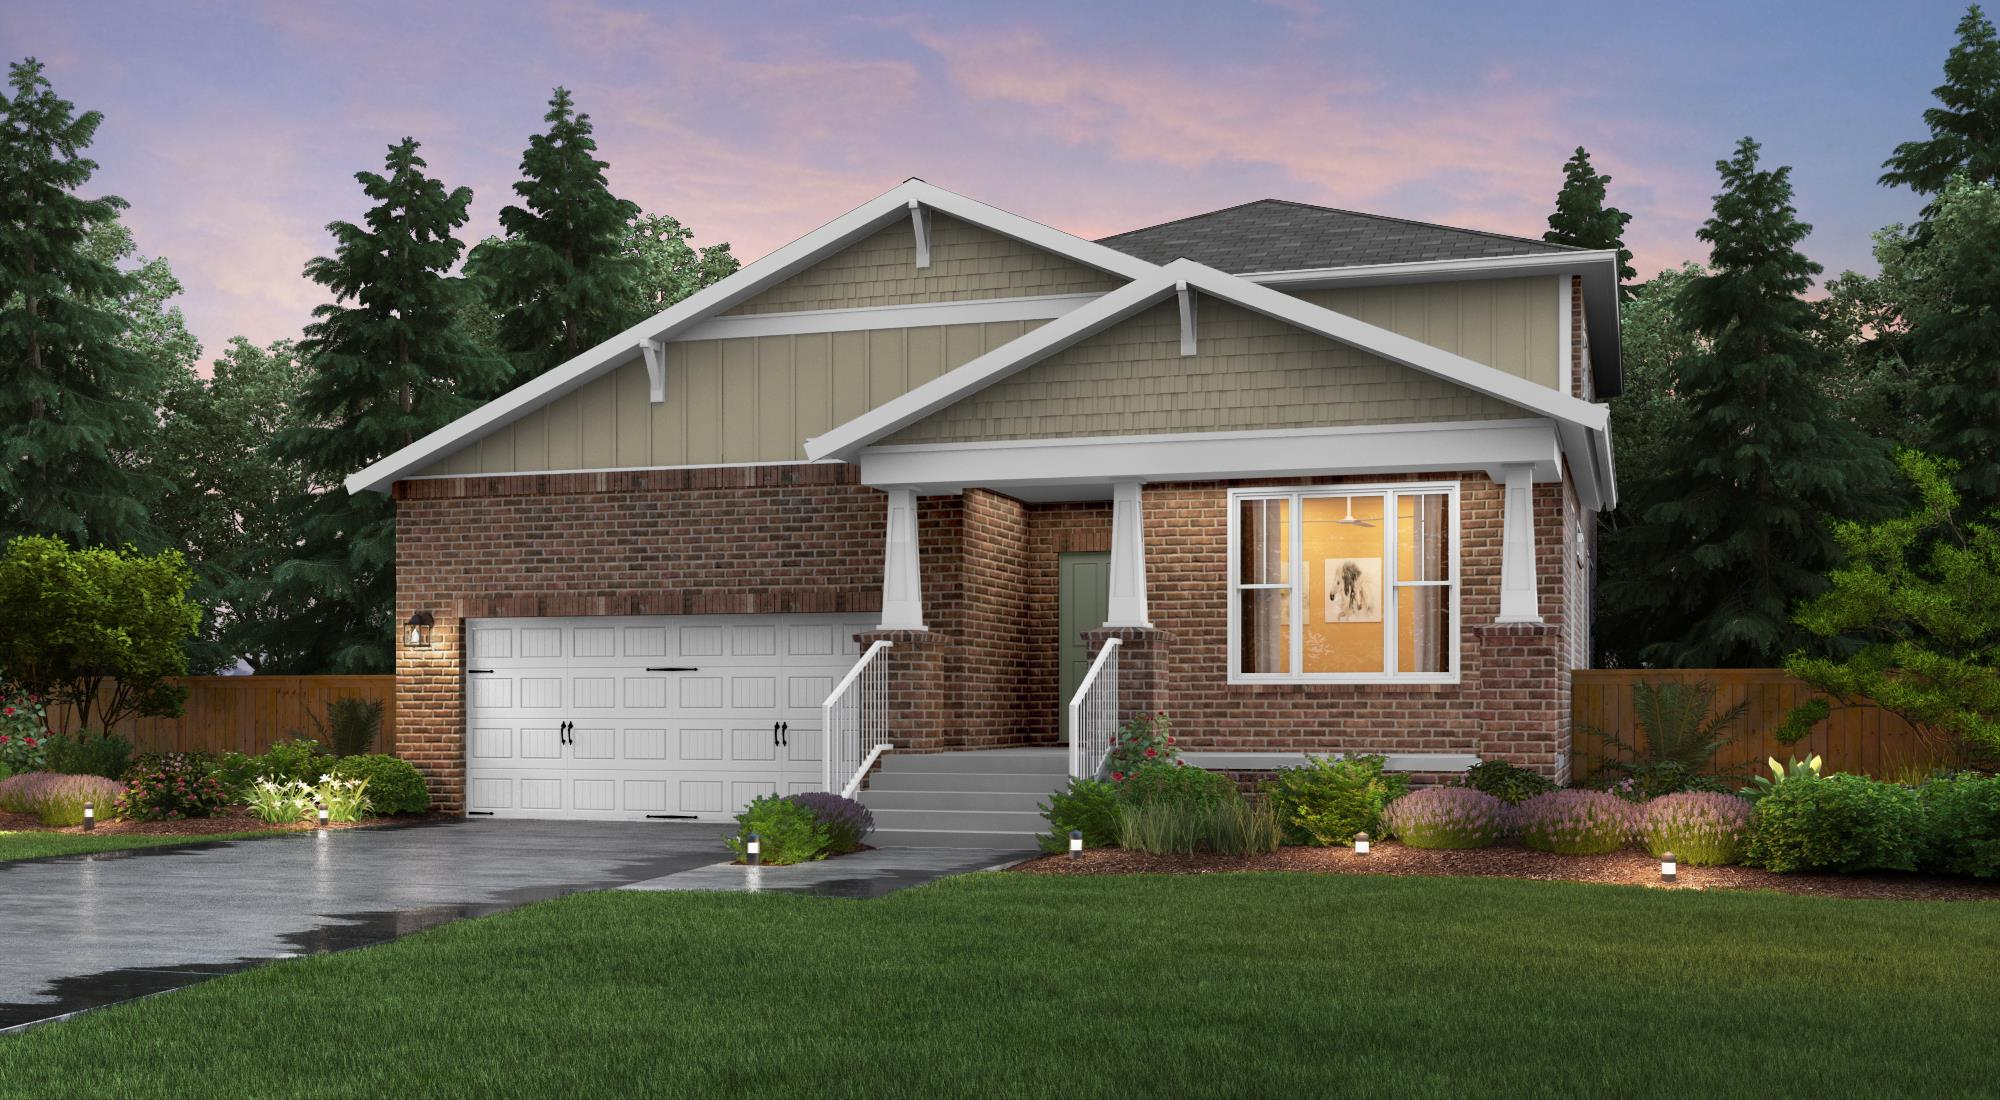 336 Disley Way- Lot 116, Murfreesboro, TN 37128 - Murfreesboro, TN real estate listing